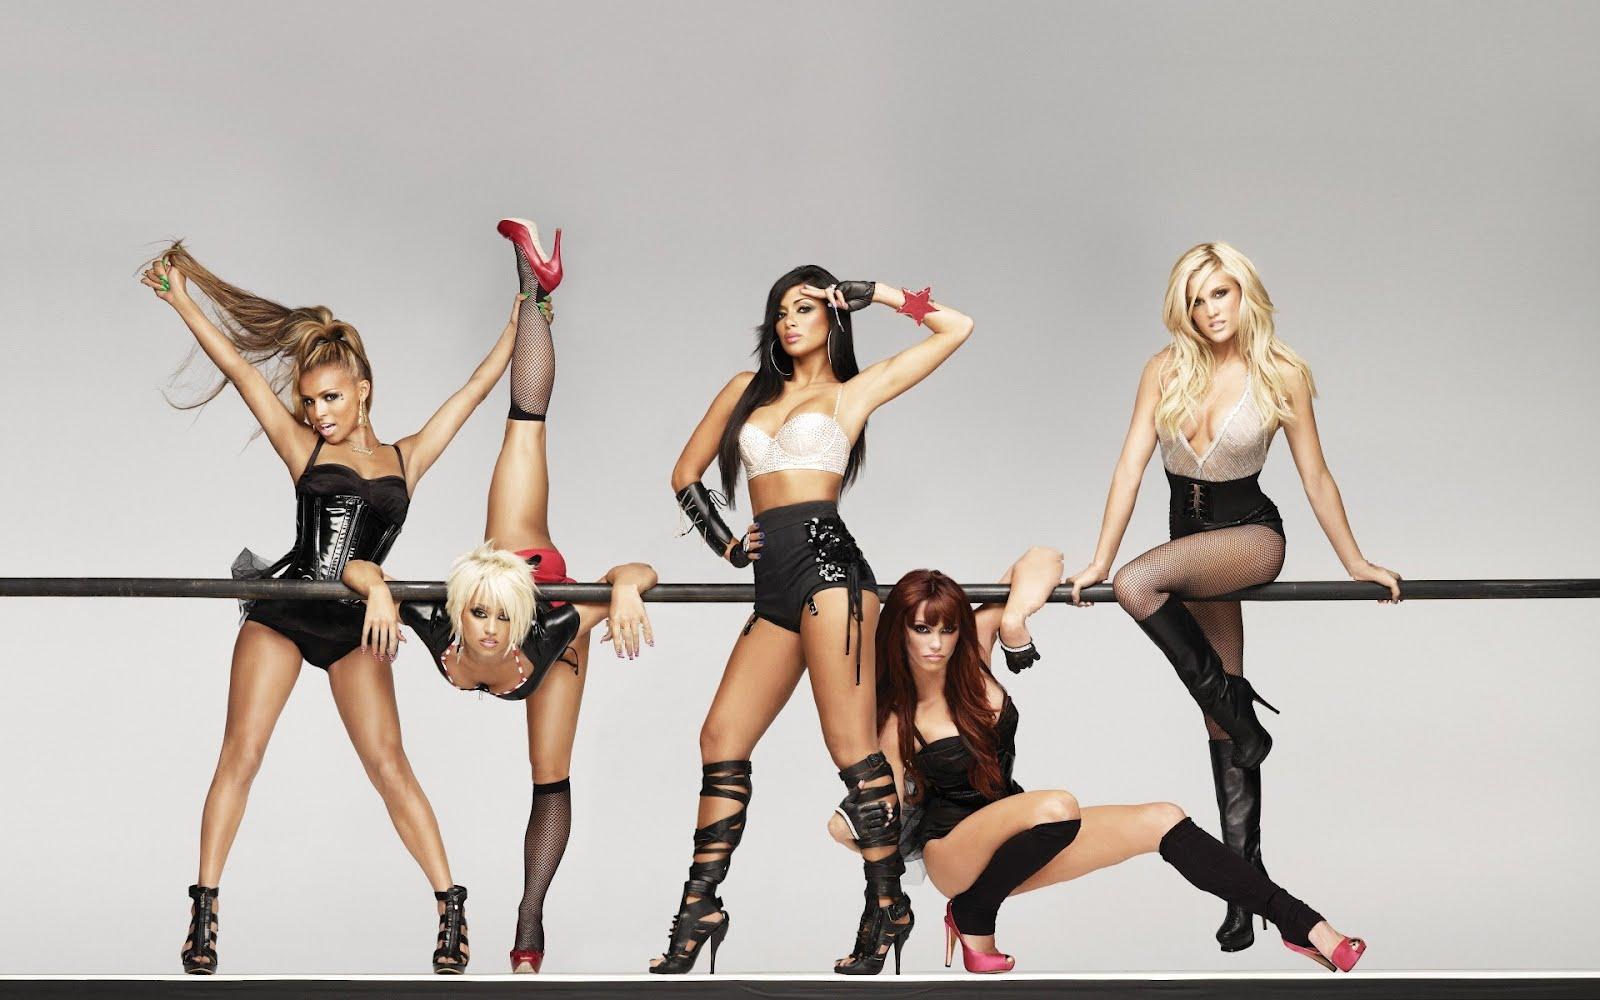 http://1.bp.blogspot.com/-V7nmONkYcFs/Ty70EQnjTOI/AAAAAAAABQ8/zGE4zDKuz5w/s1600/Pussycat_Dolls.jpg